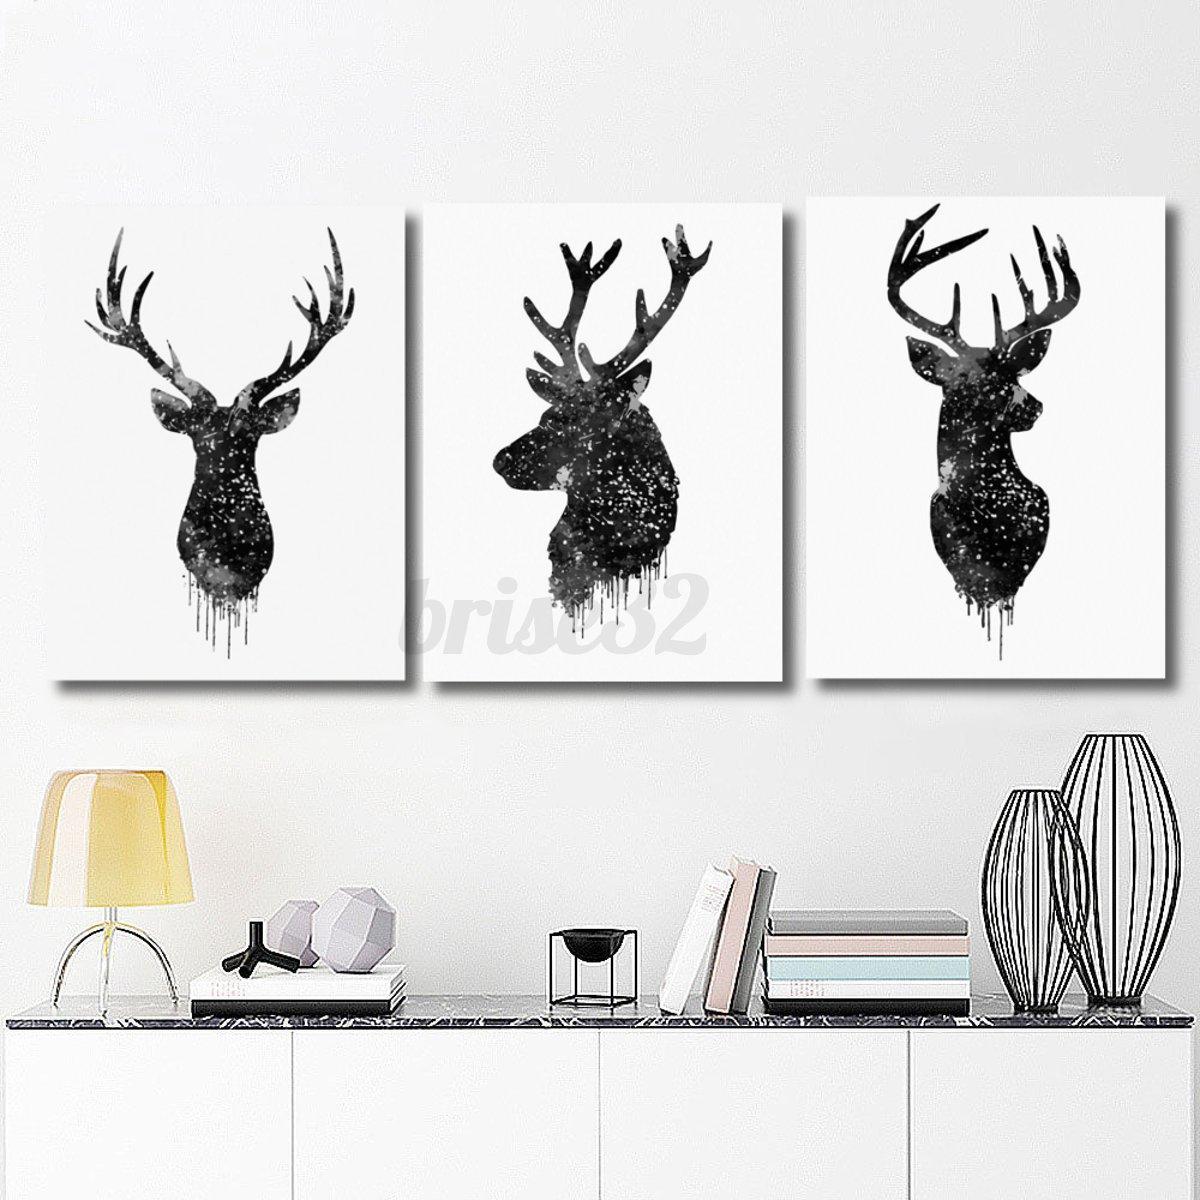 Deer-Head-Animal-Minimalist-Canvas-Print-Poster-Watercolor-Painting-Modern-Decor